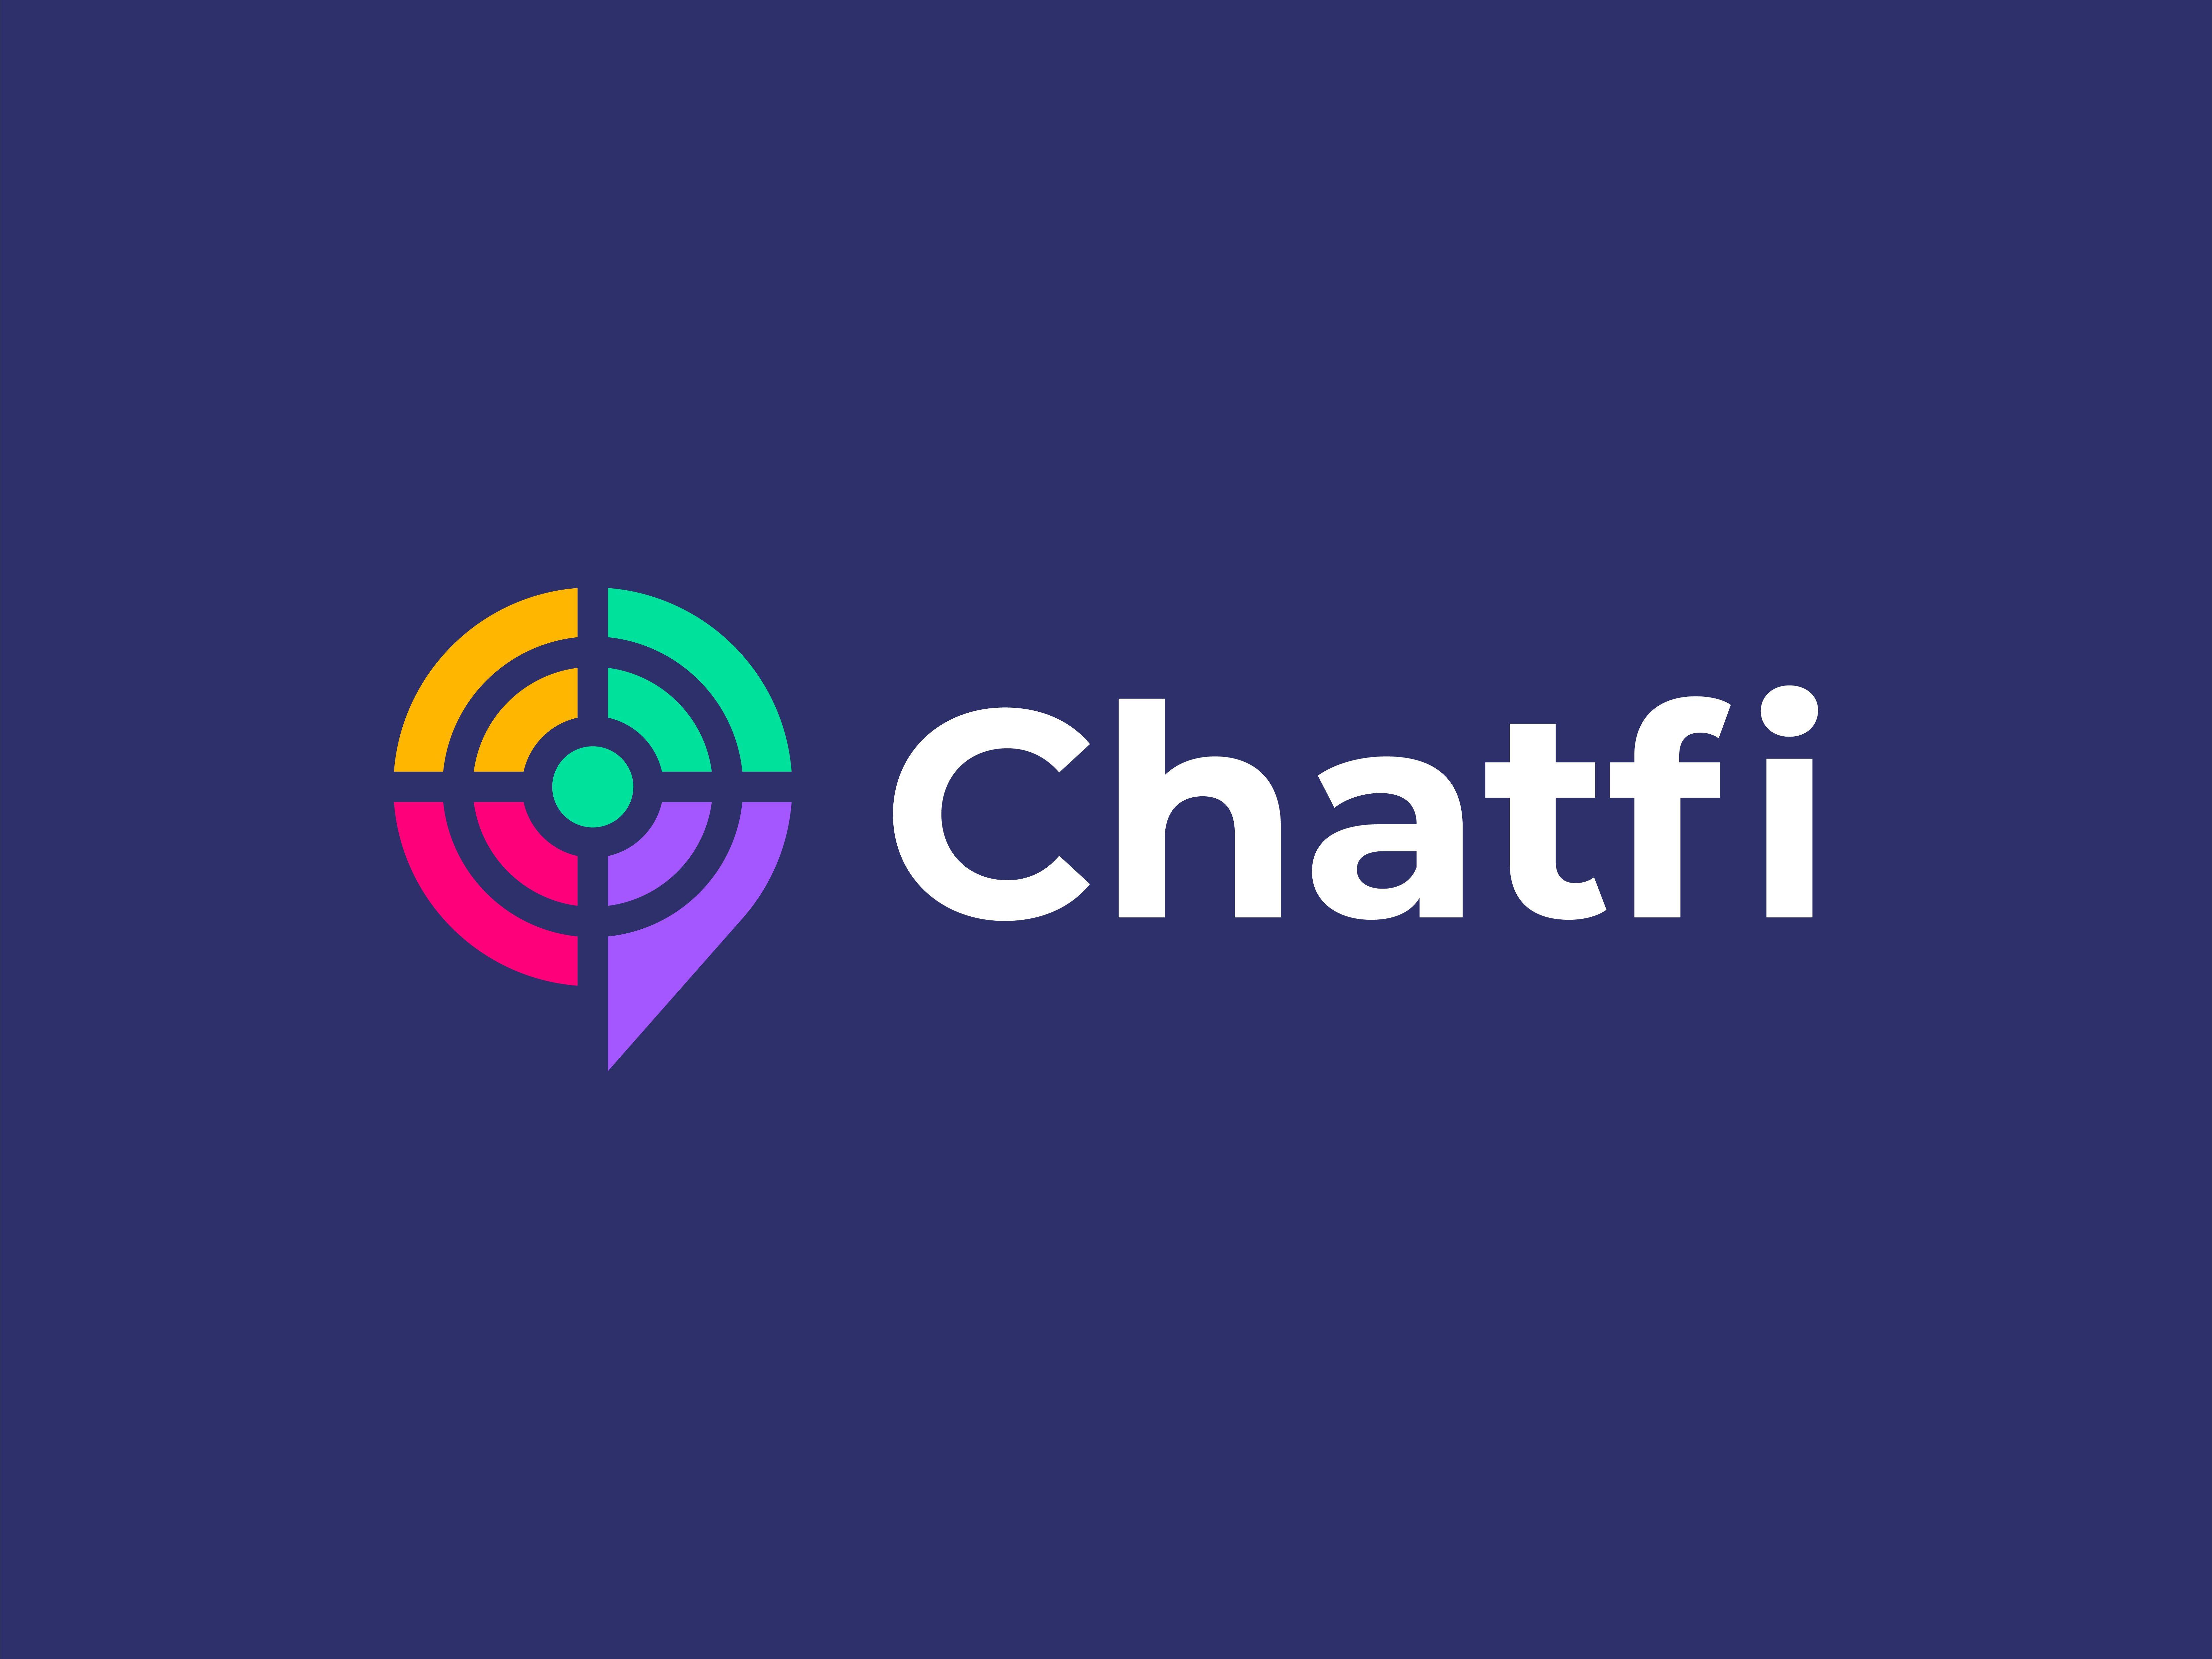 Chatfi